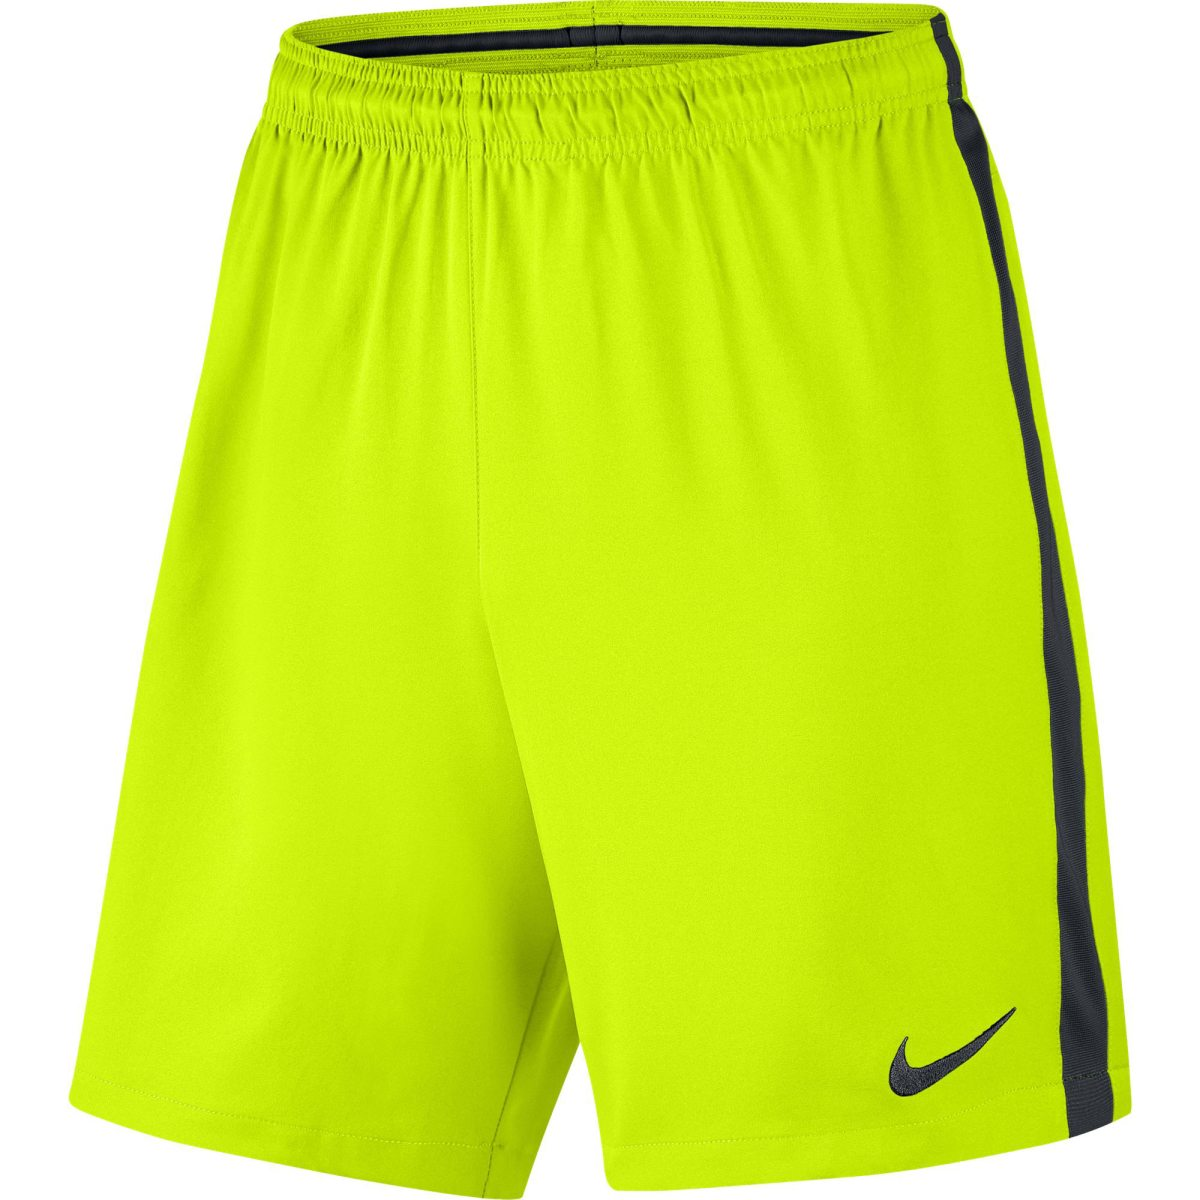 size 40 55d9a 1aaba gul nike dry football short squad träningsshorts senior shorts